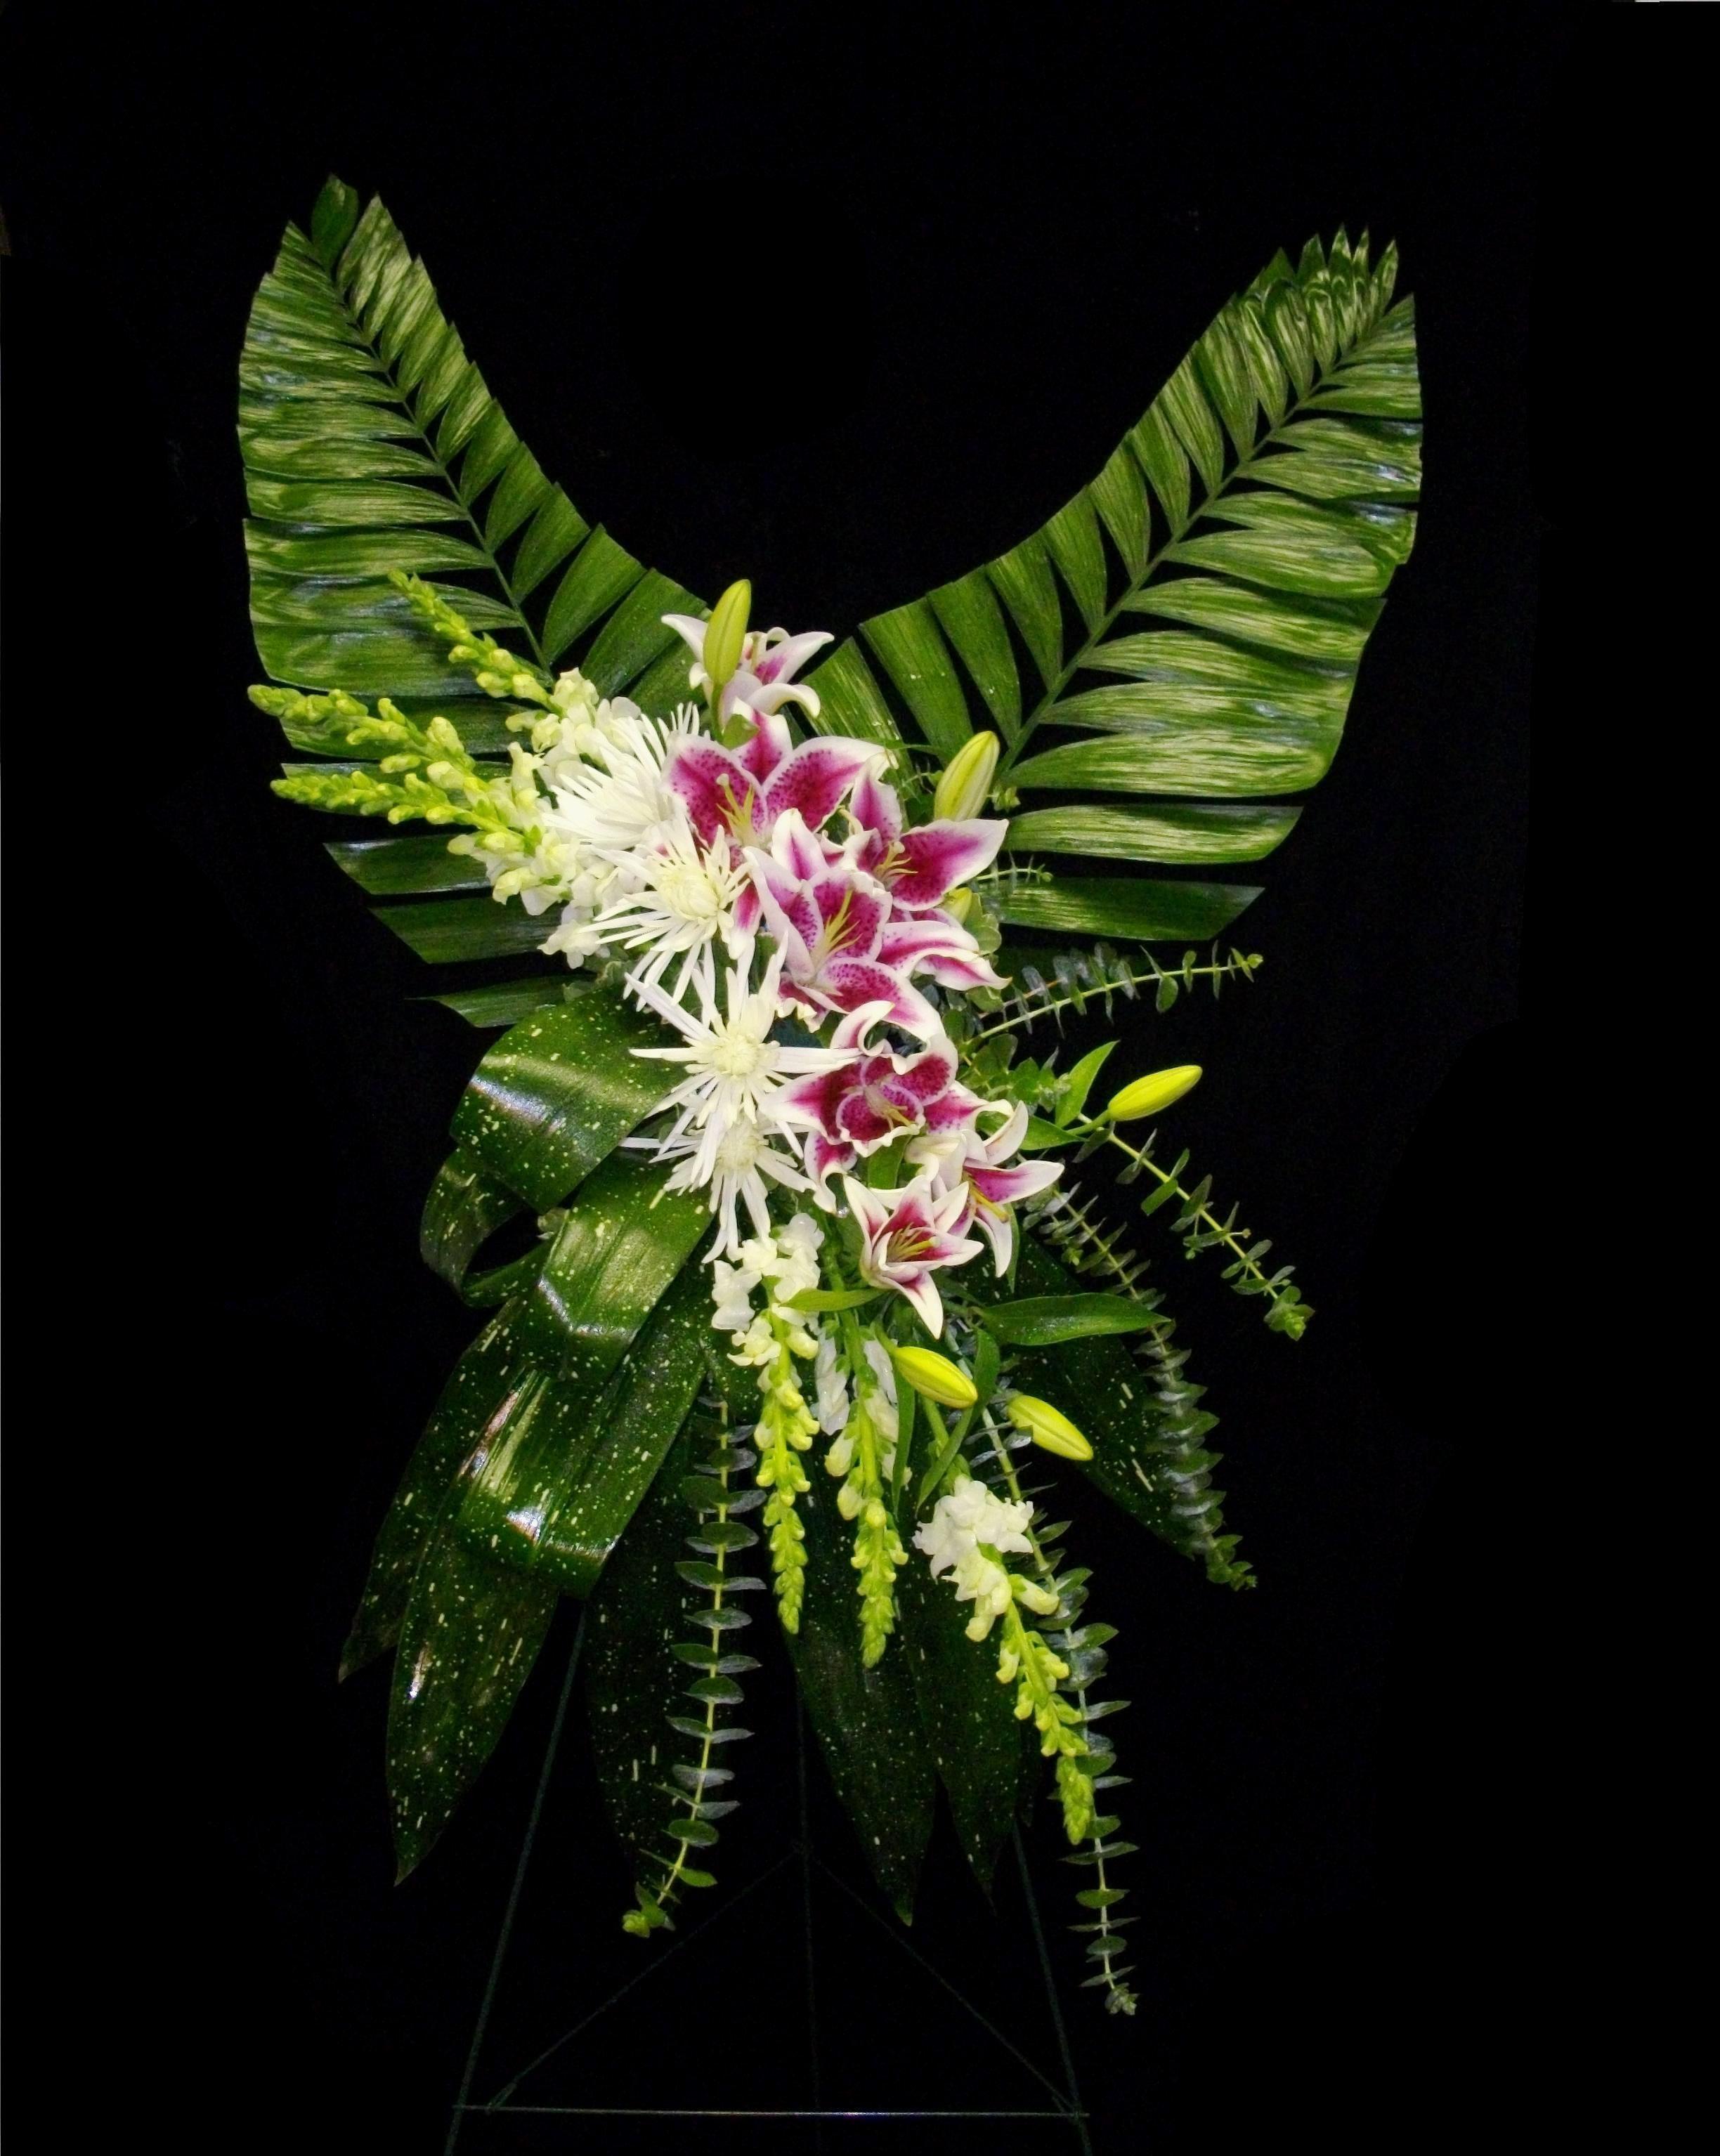 Angel wings standing spray aifd pinterest angel wings funeral angel wings standing spray funeral arrangementsflower izmirmasajfo